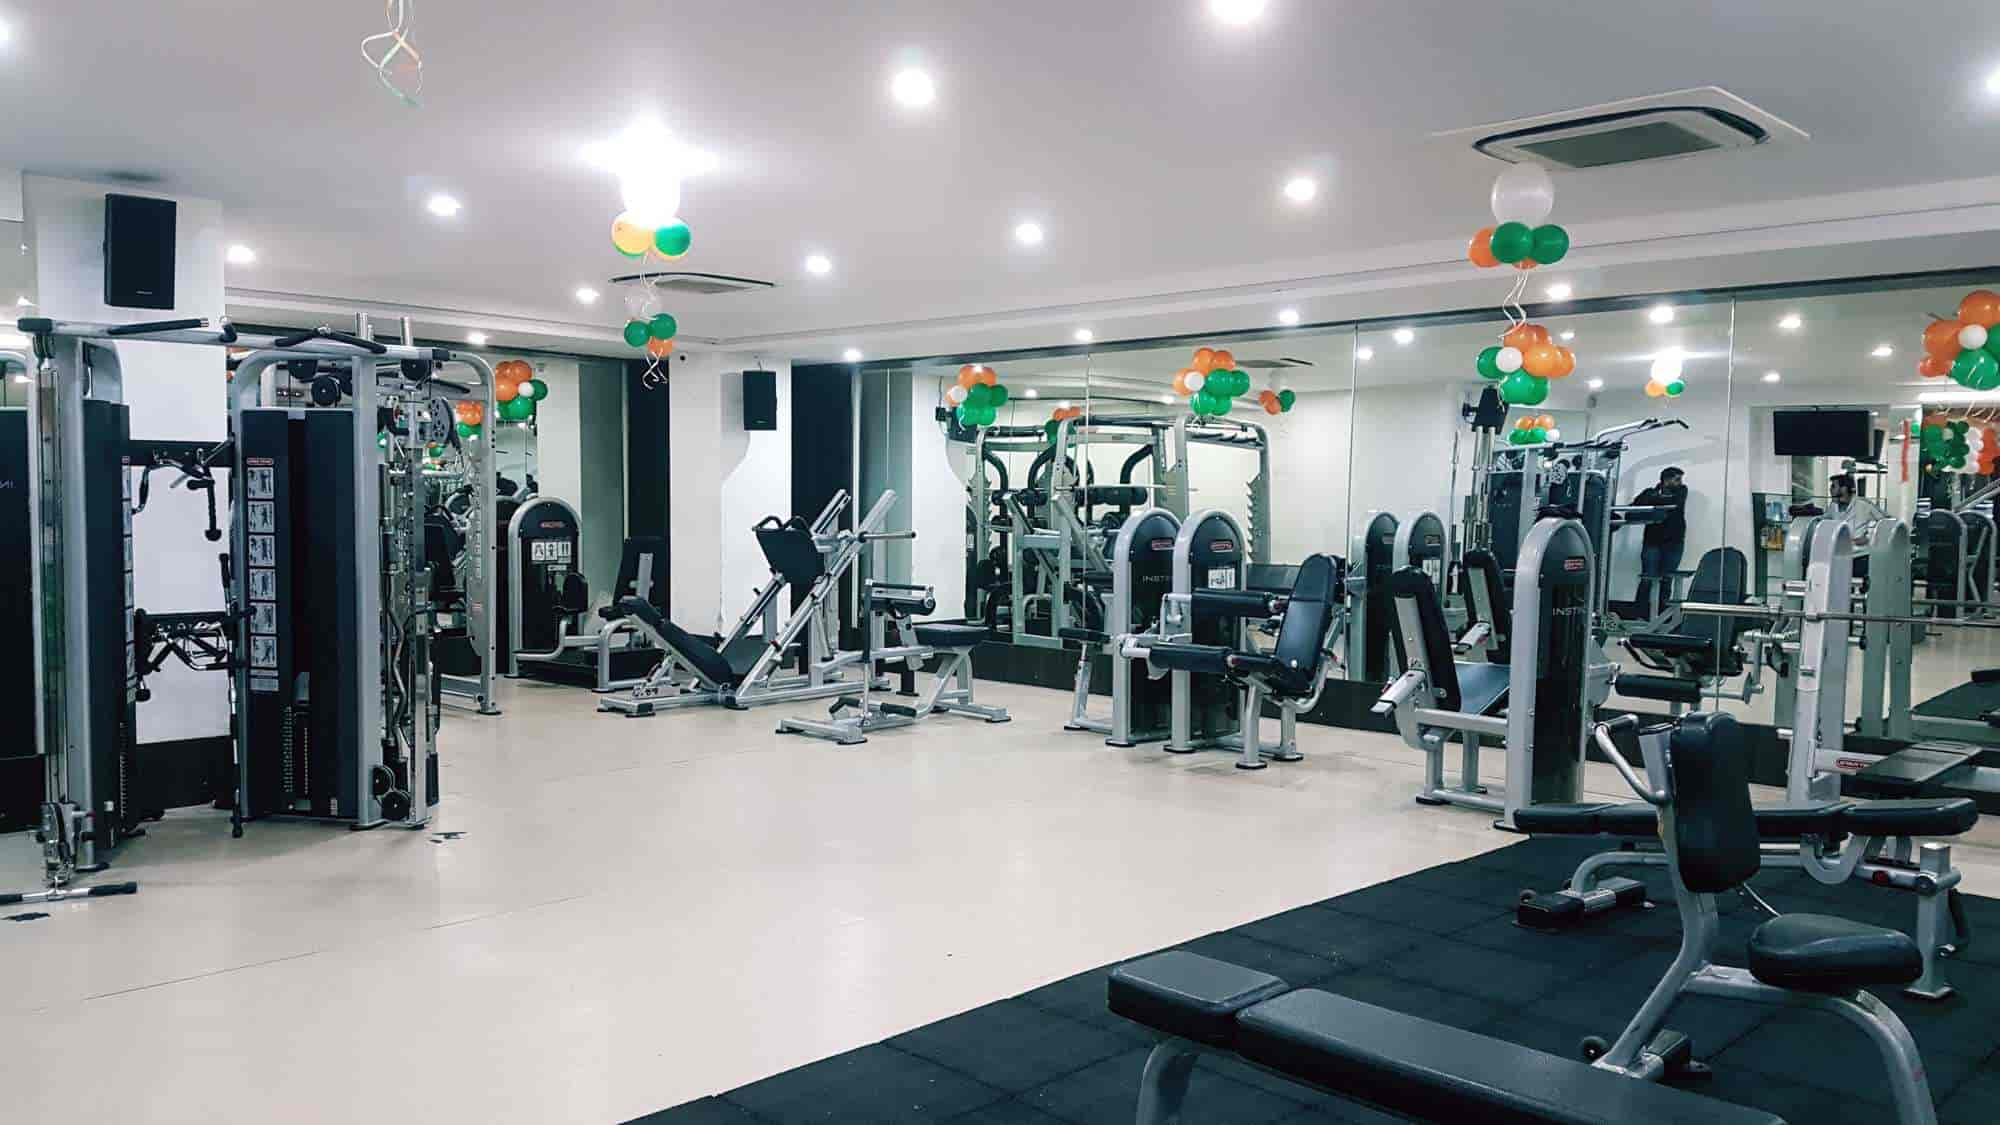 Golds Gym, Ramdas Colony - Gyms in Jalgaon - Justdial